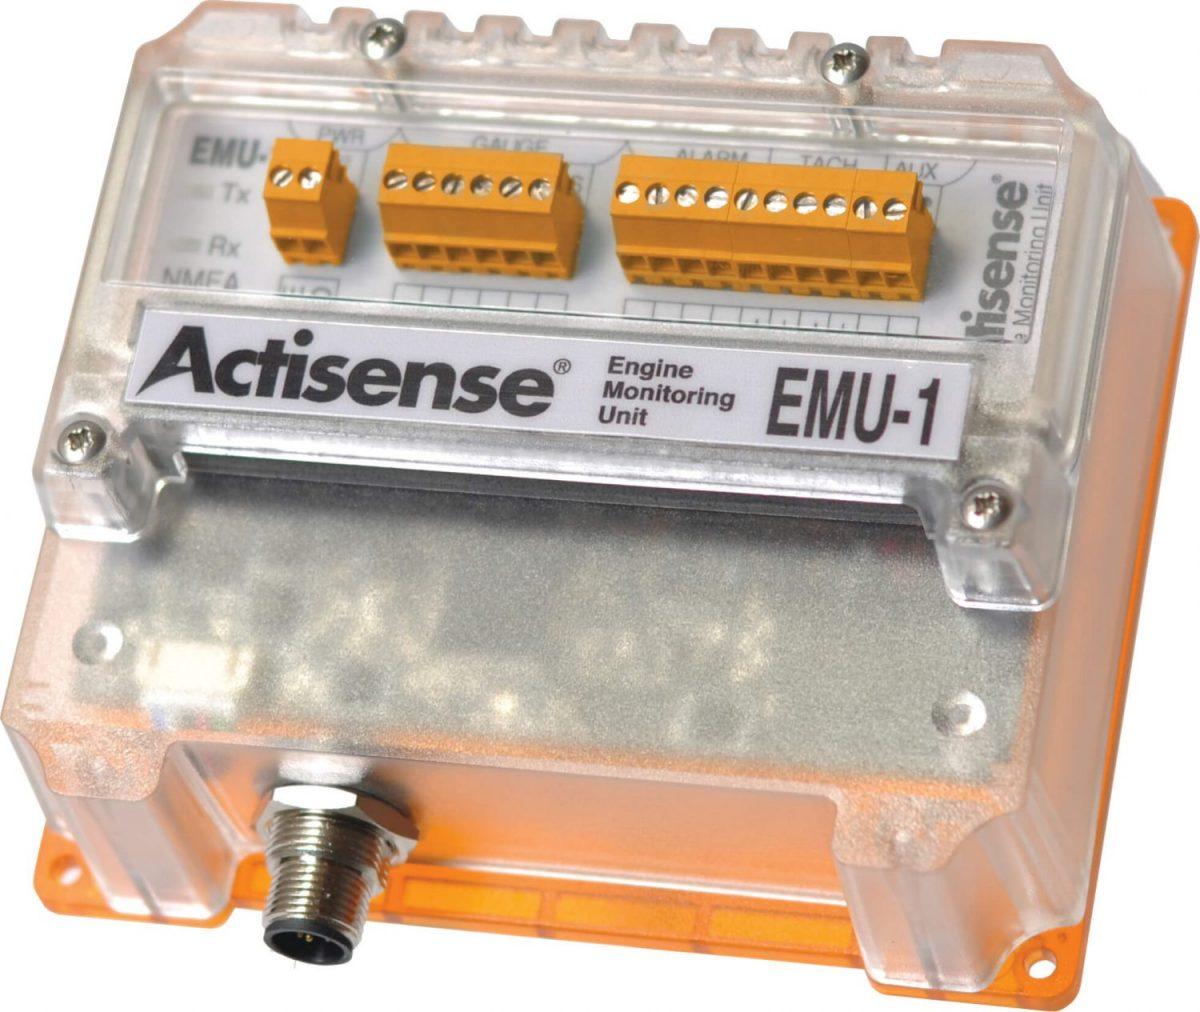 EMU-1 Engine Monitoring Unit   Analogue to NMEA 2000   Analog to NMEA 2000